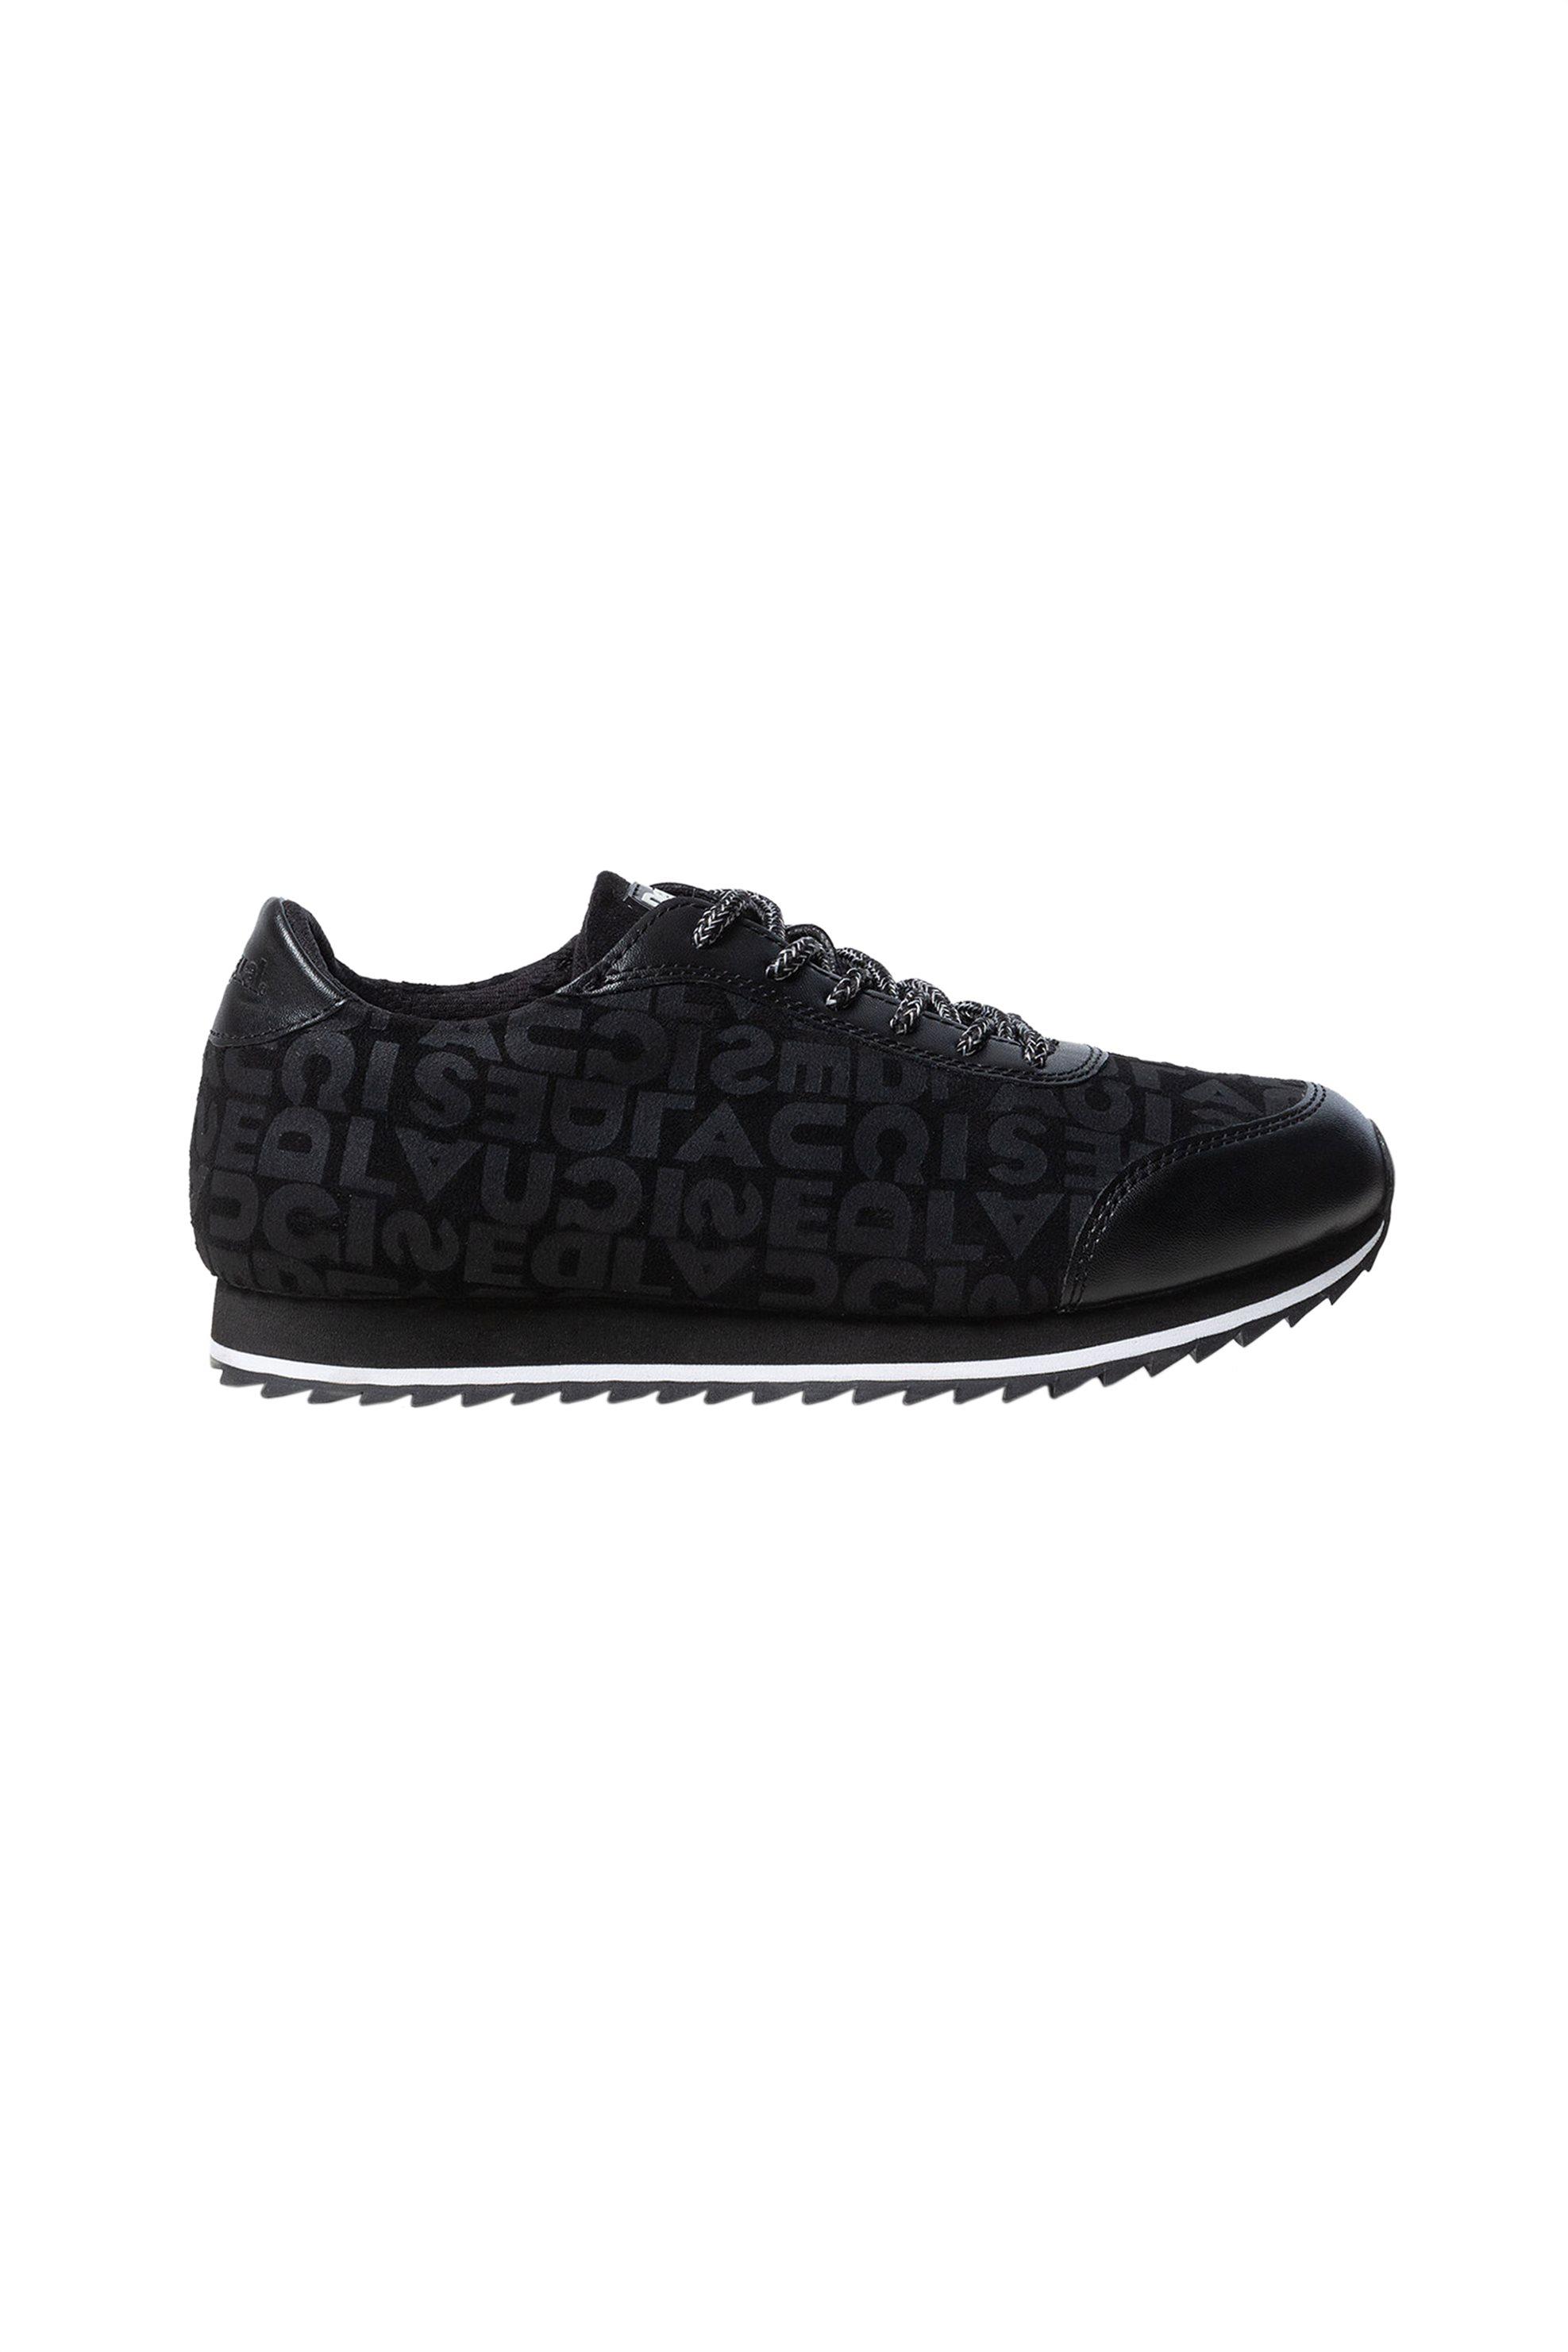 Desigual γυναικεία sneakers με logo letter print